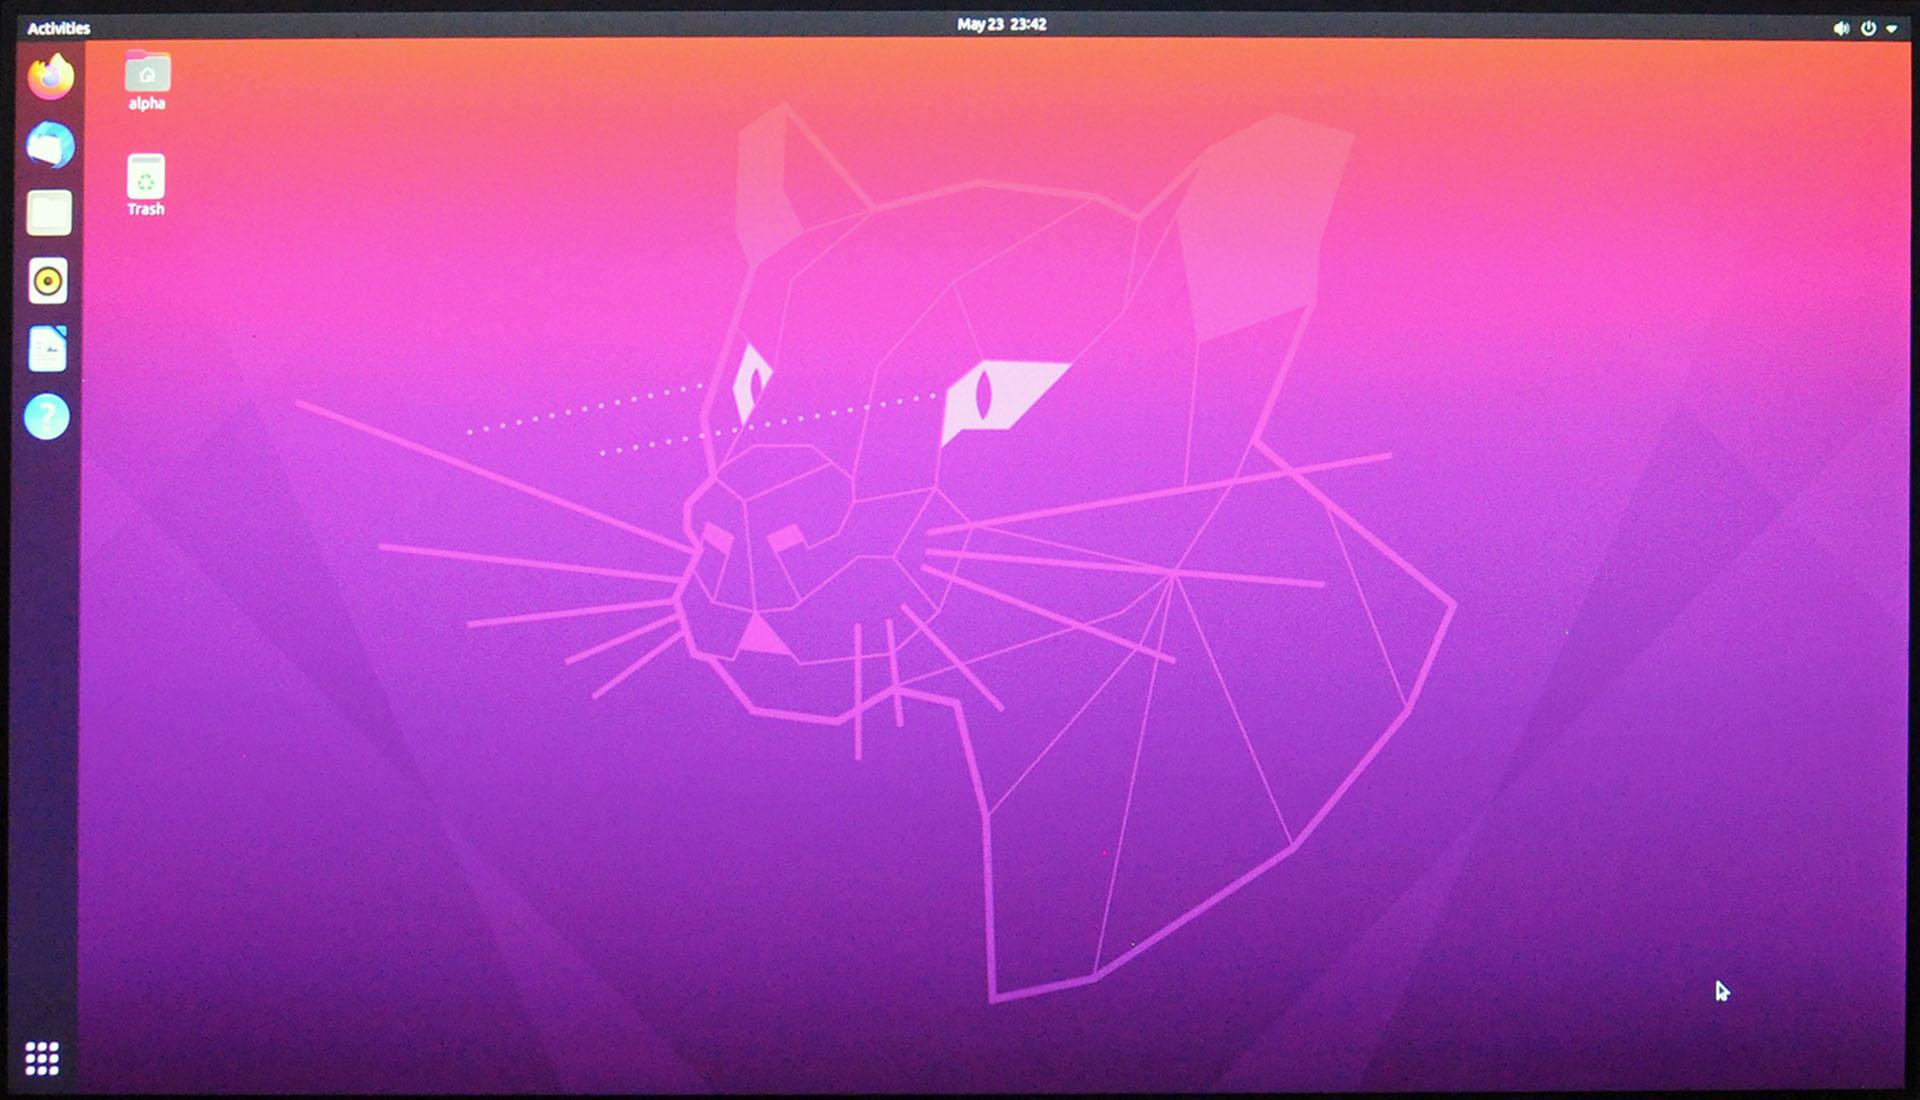 Install Ubuntu 20.04 LTS - Dashboard